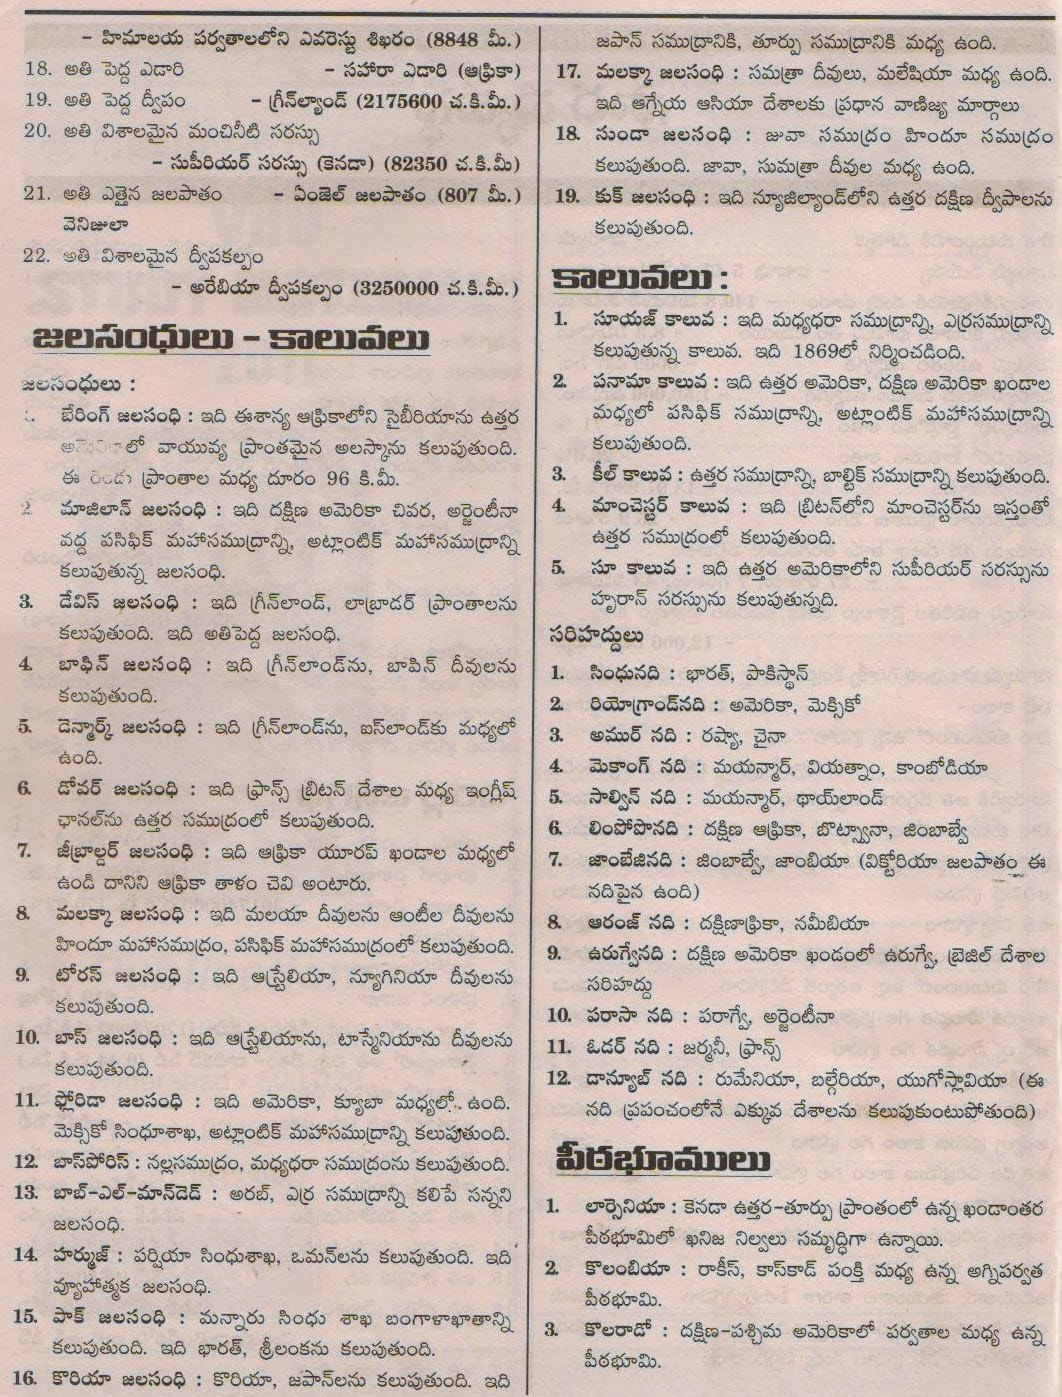 Vro Vra Study Material In Telugu Pdf